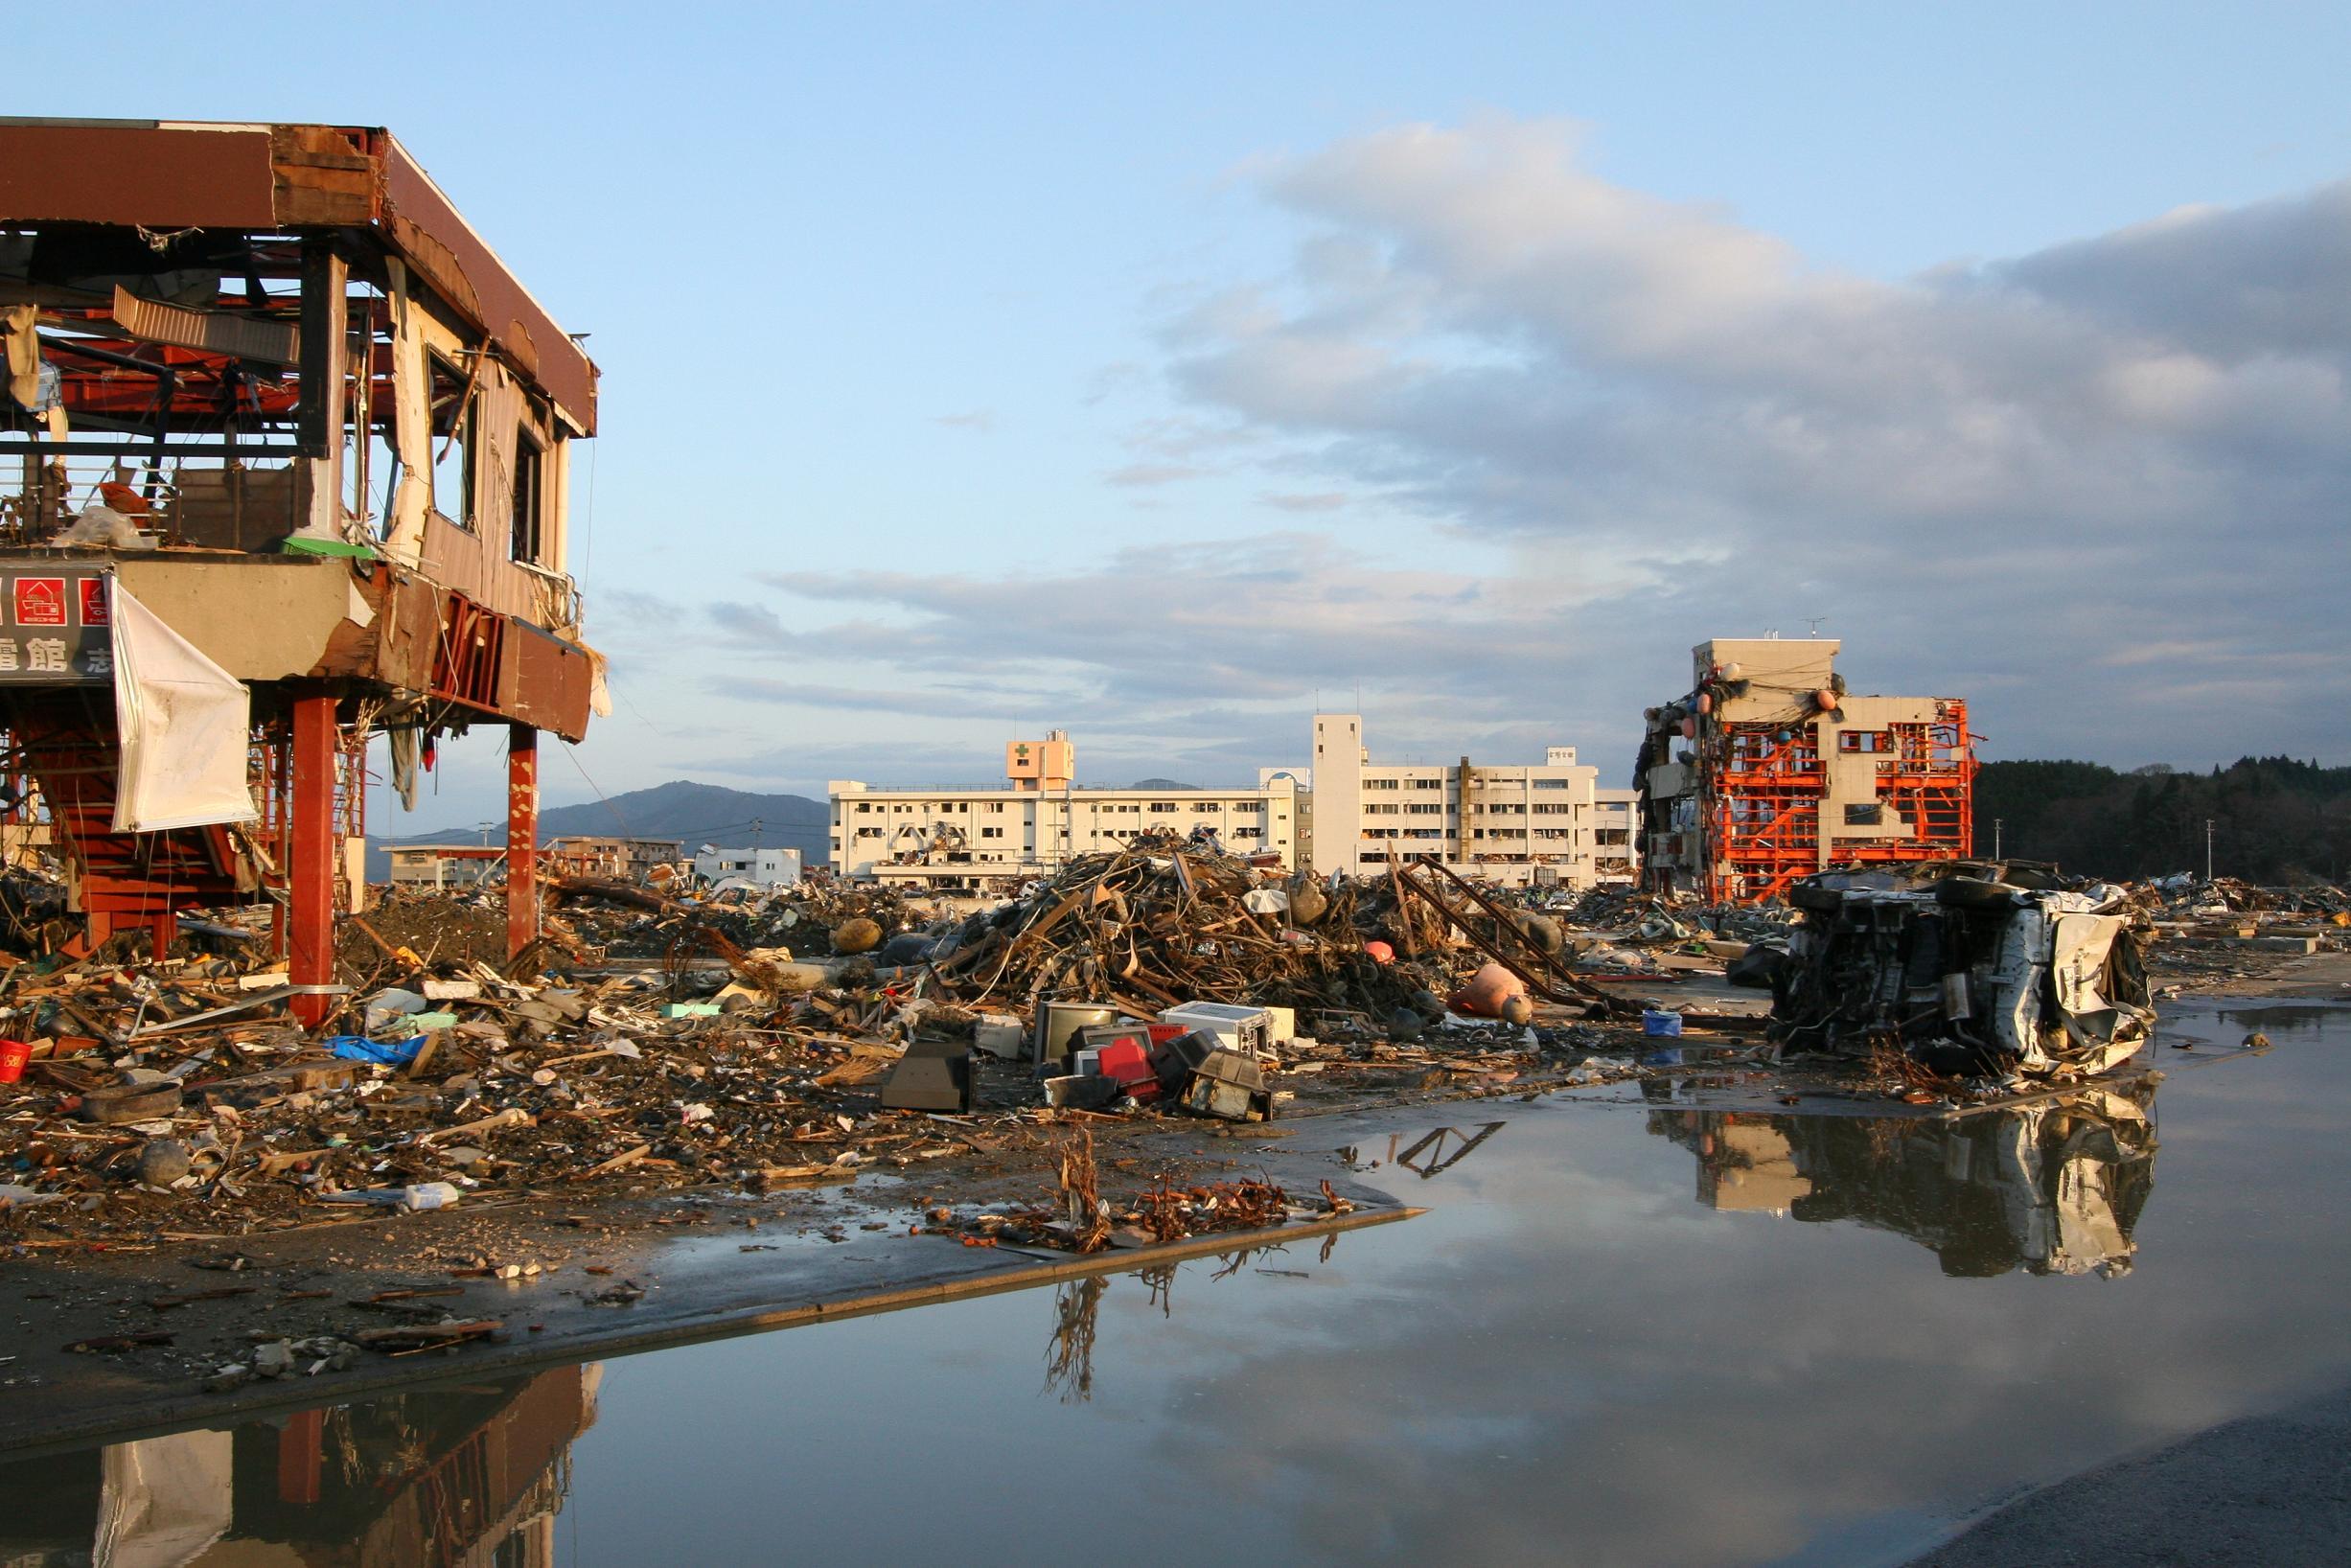 Around_Shizugawa_Public_Hospital_in_Minamisanriku_after_tsunami.jpg